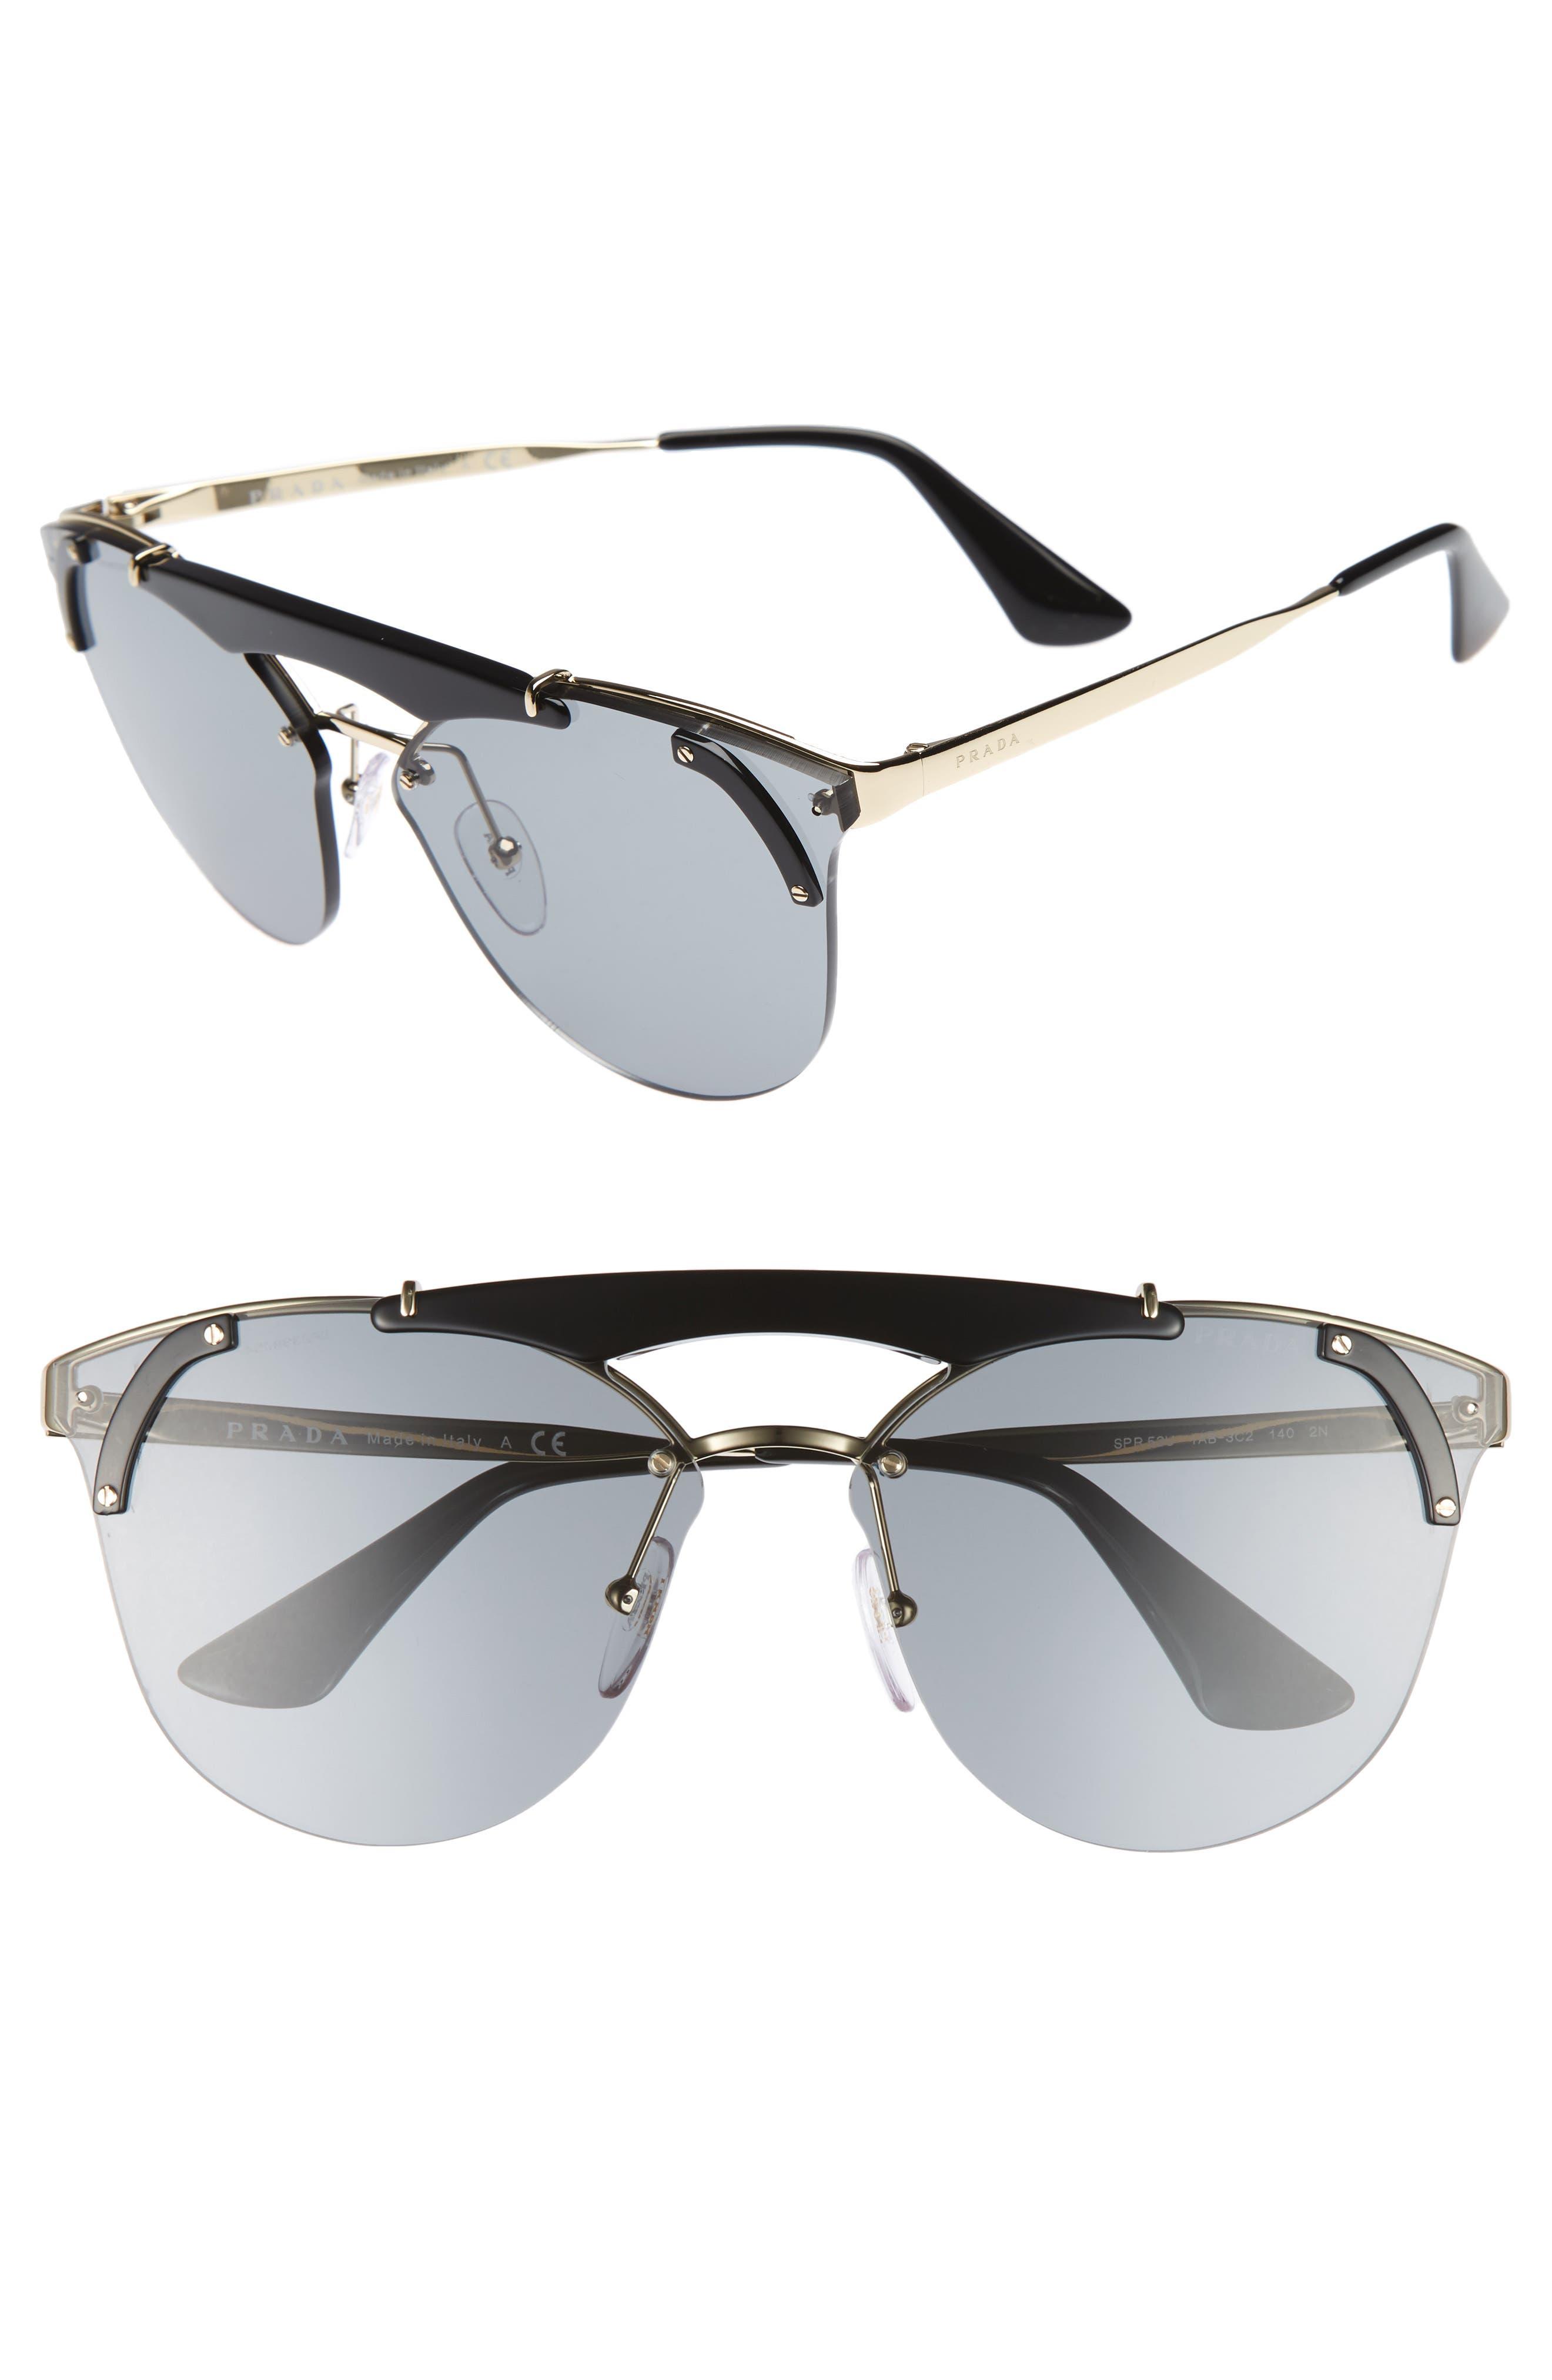 53mm Round Sunglasses,                         Main,                         color, 710